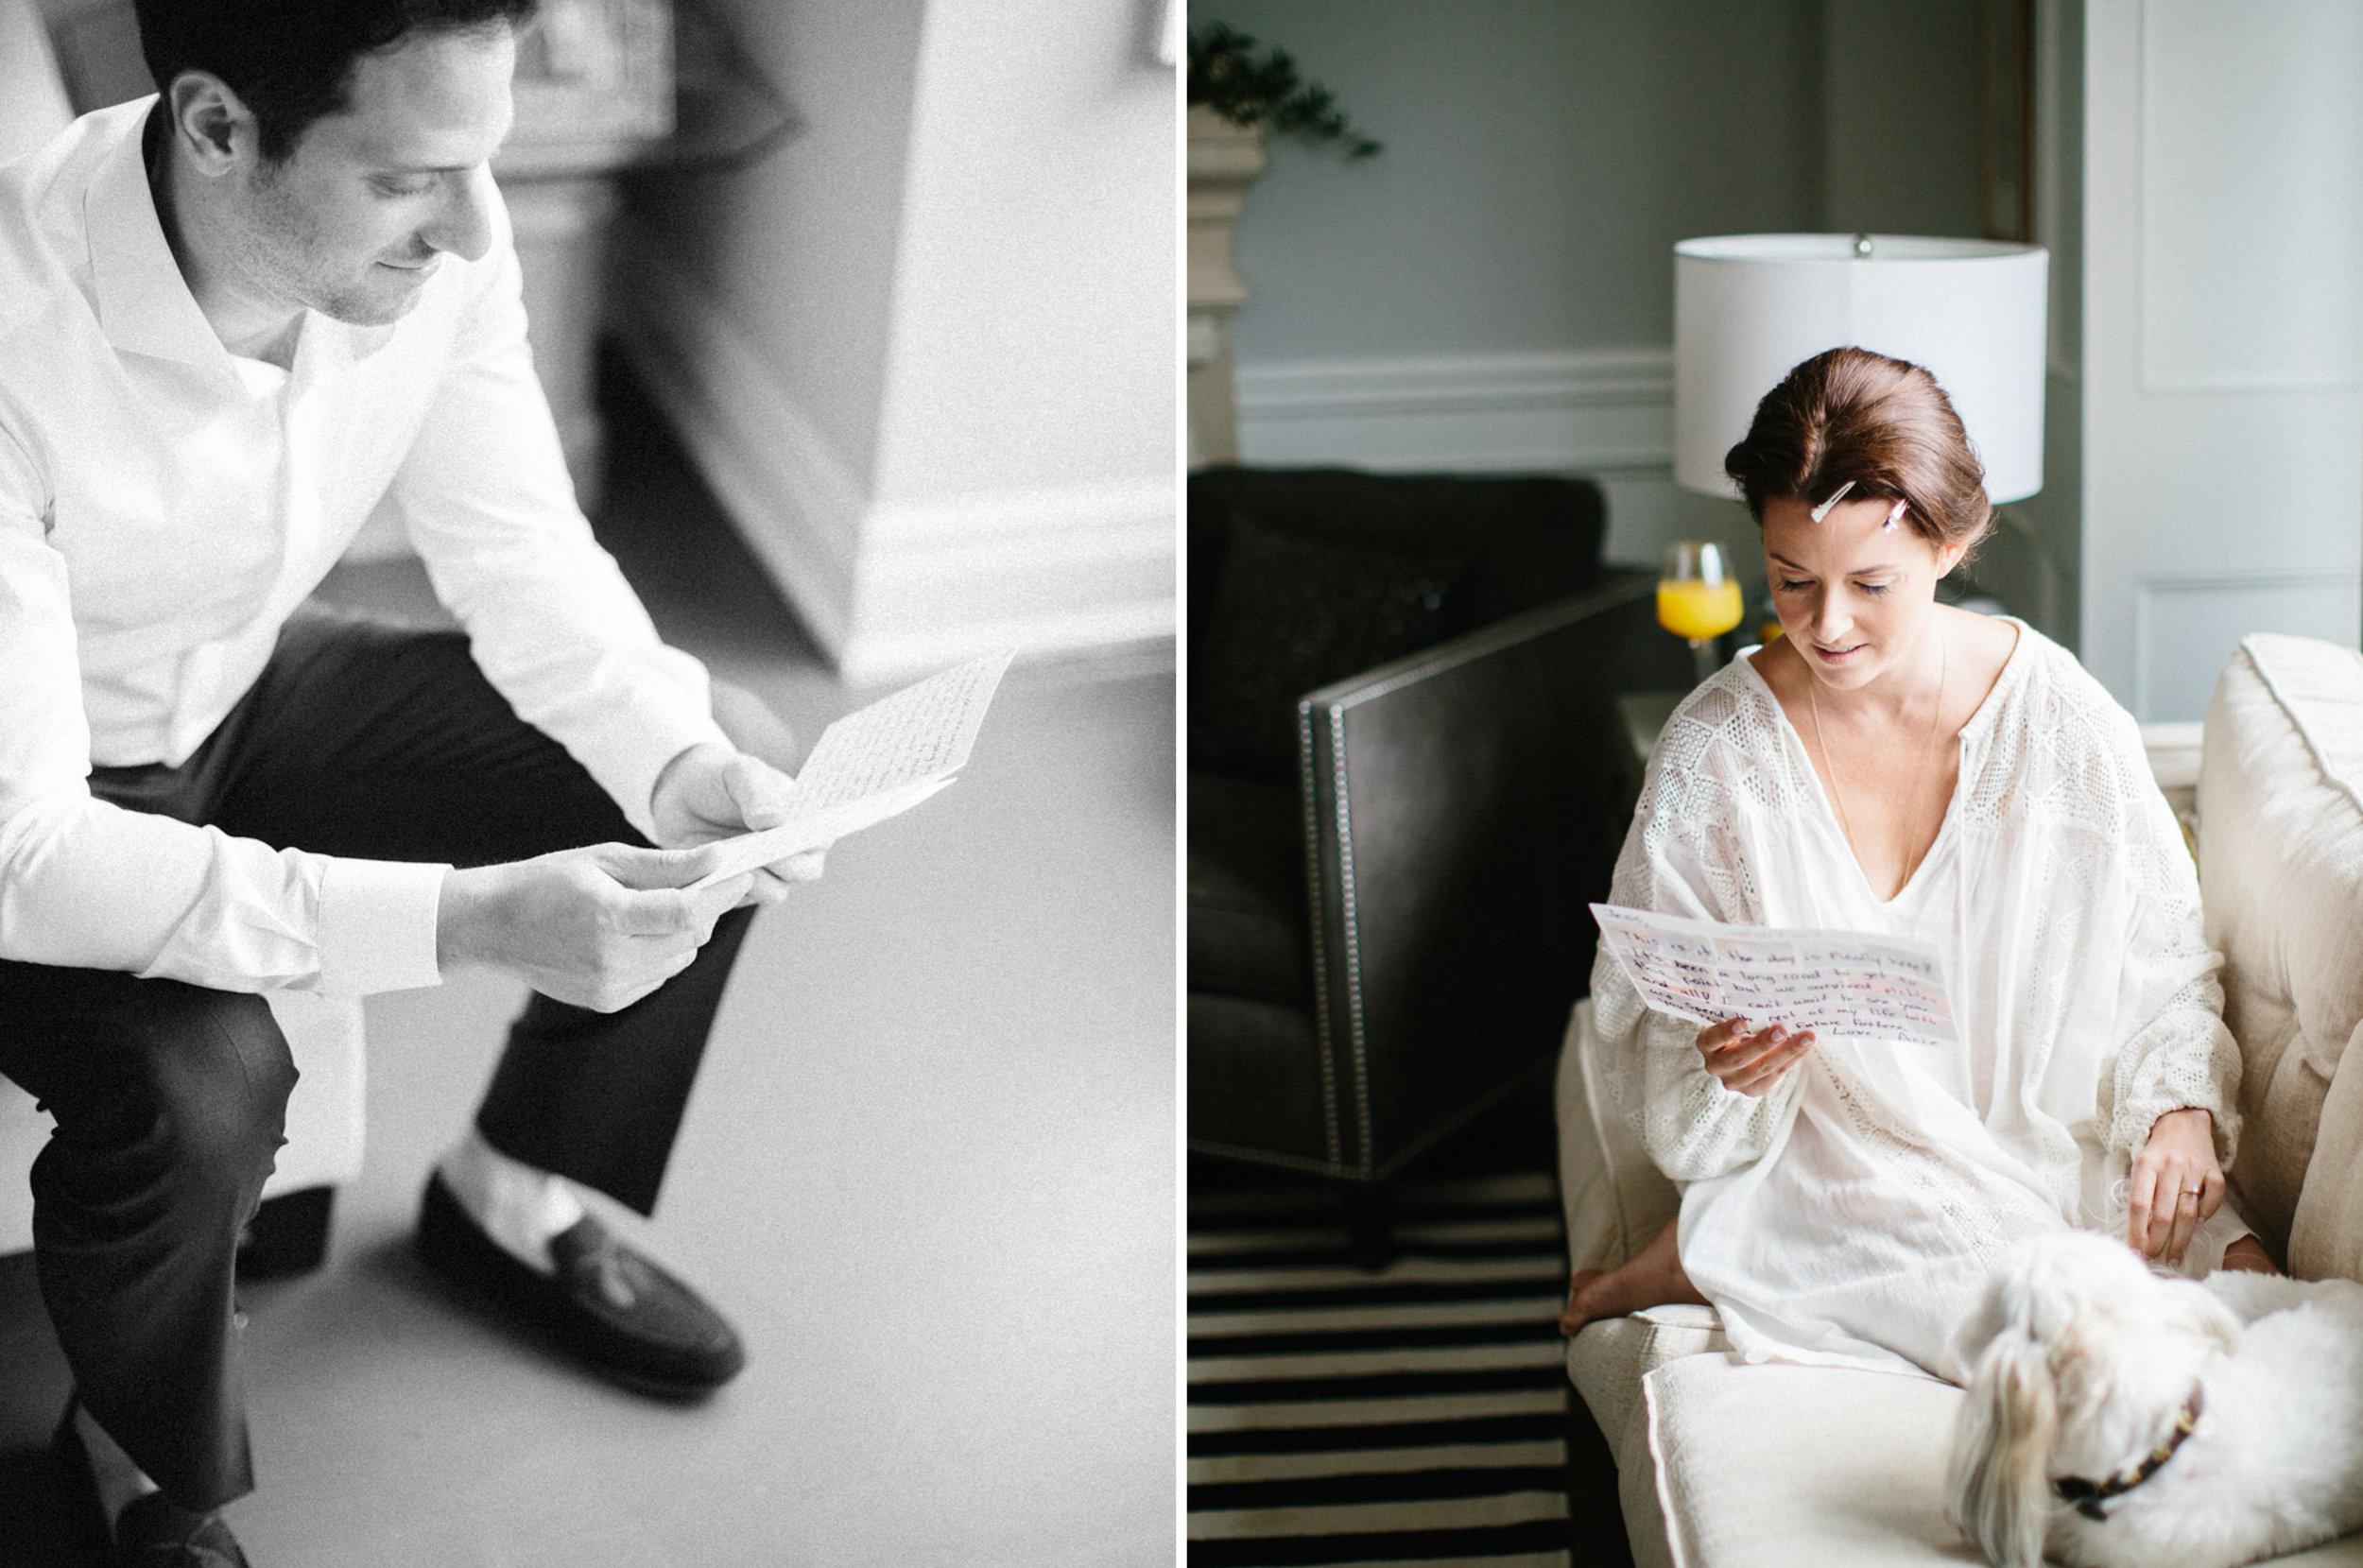 toronto_wedding_photographer_fine_art_the_great_hall1.jpg